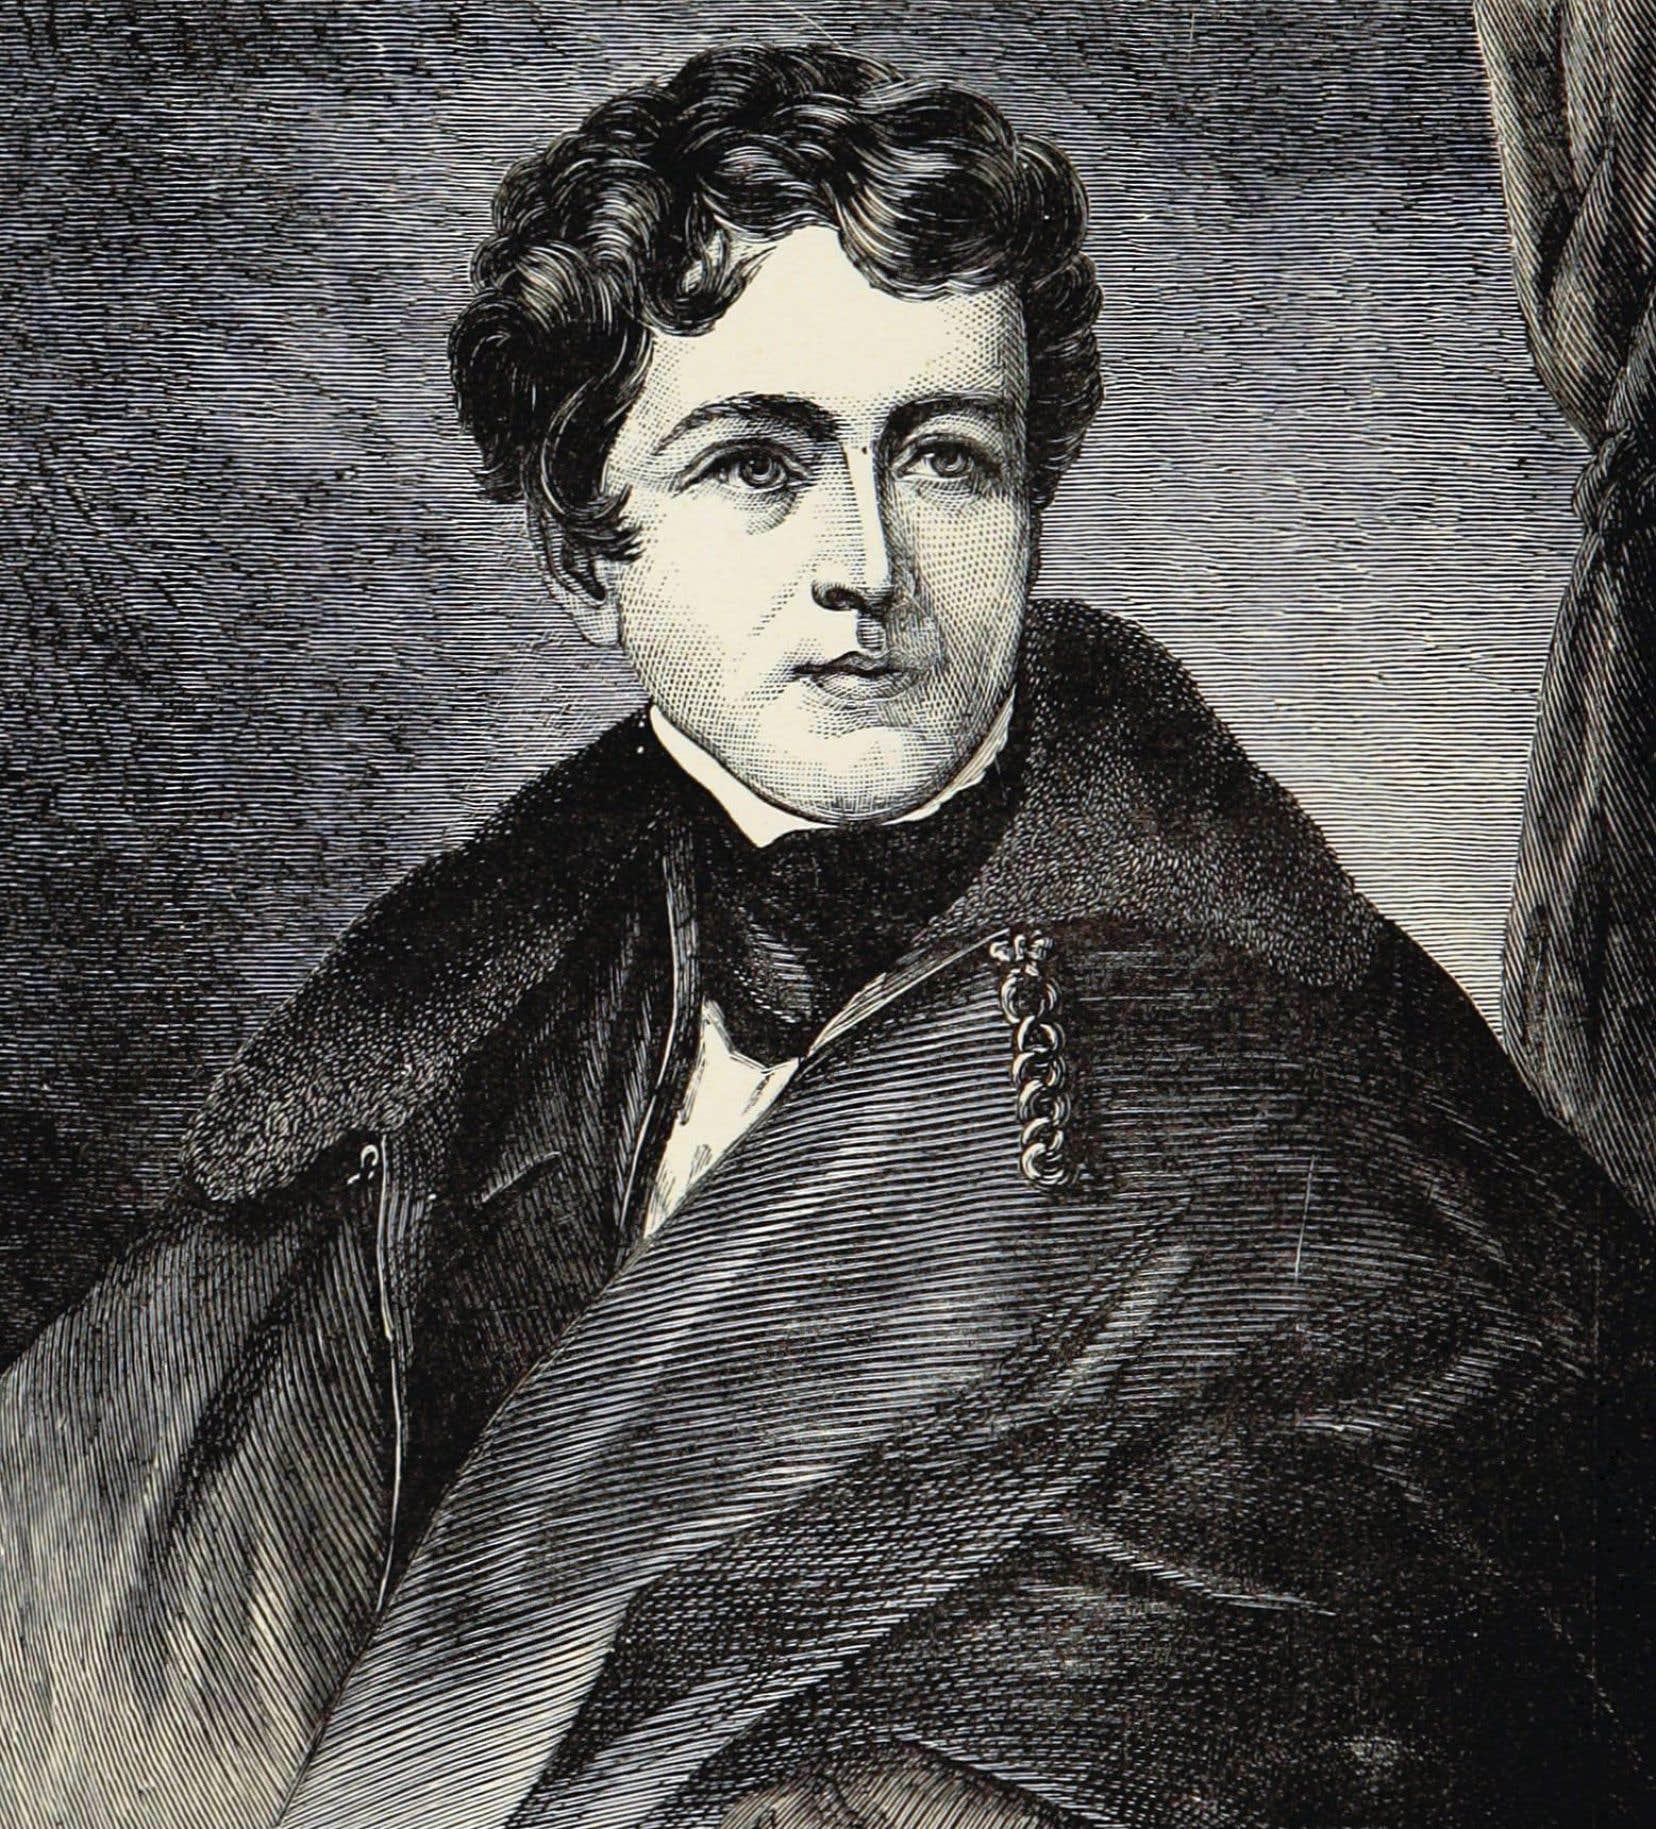 Portrait de John George Lambton, 1ercomte de Durham